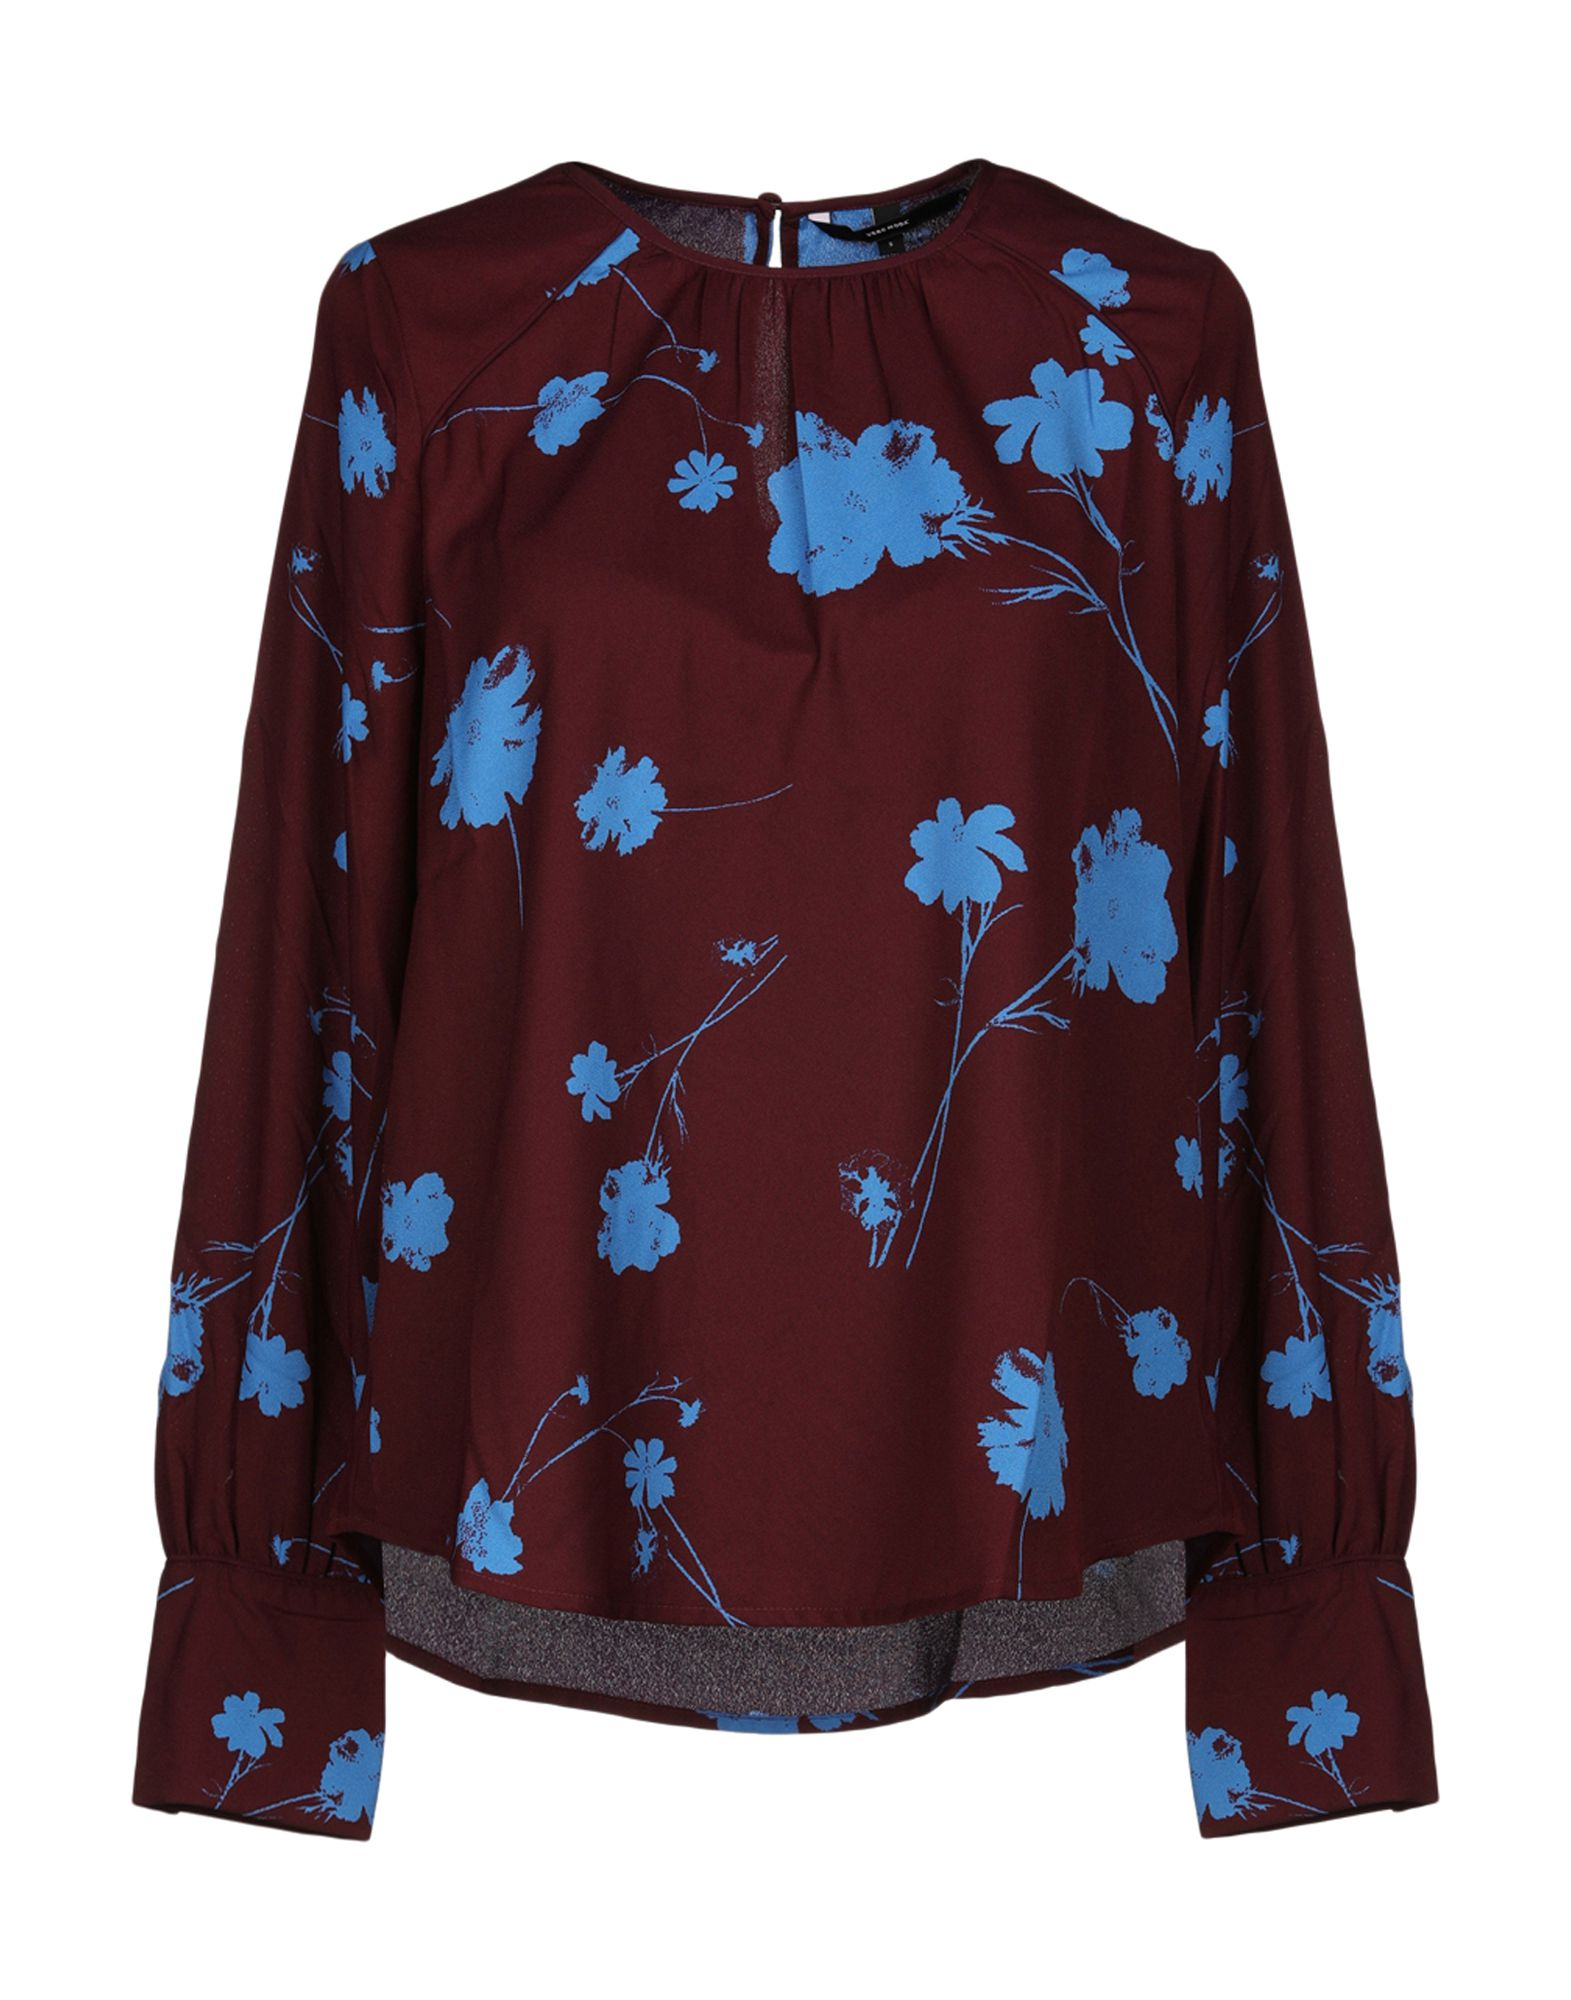 VERO MODA Блузка блузка alba moda klingel цвет серый рисунок